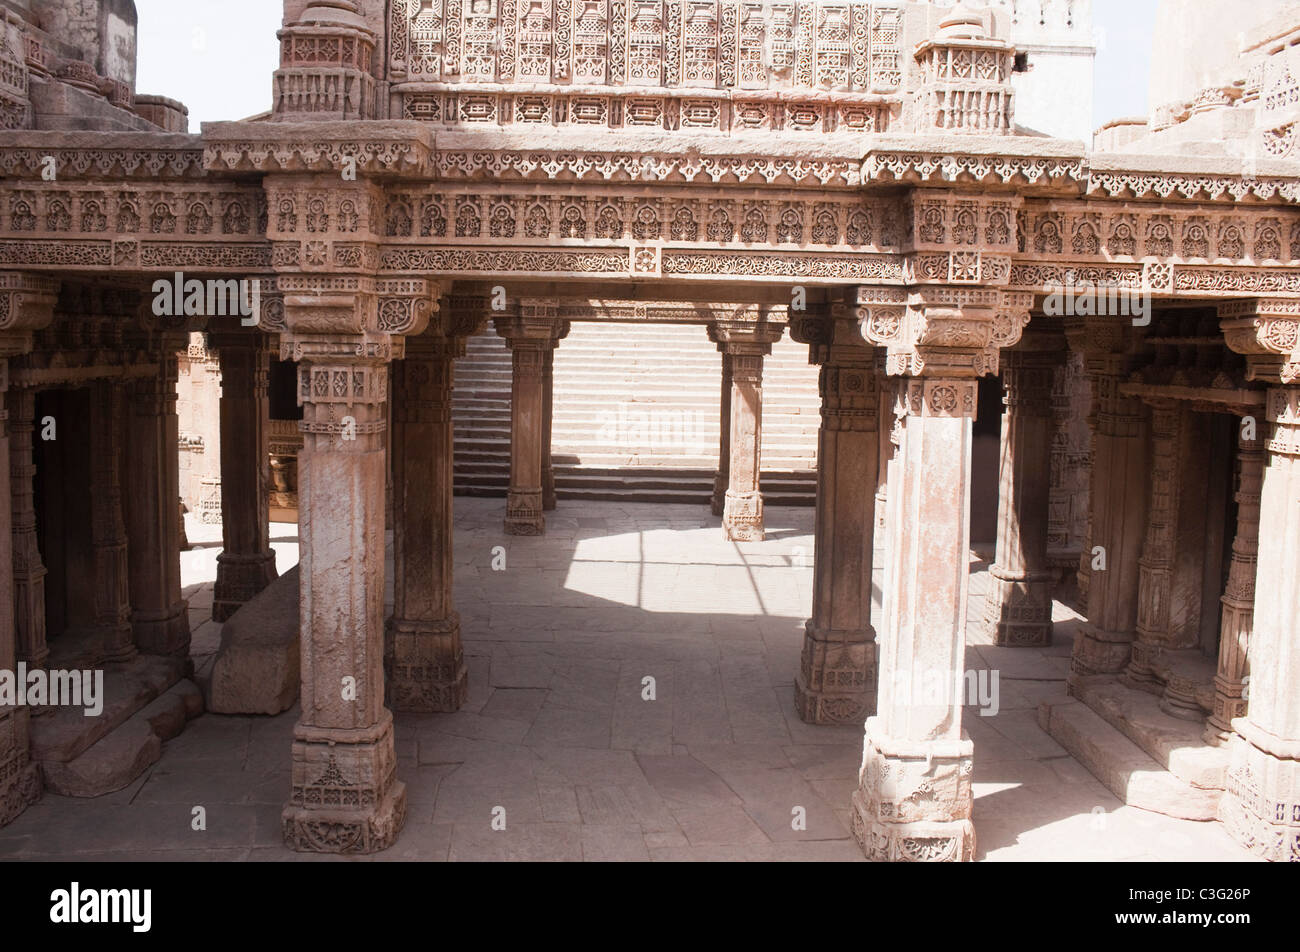 Architectural details of a building, Rani ki Vav, Patan, Ahmedabad, Gujarat, India - Stock Image